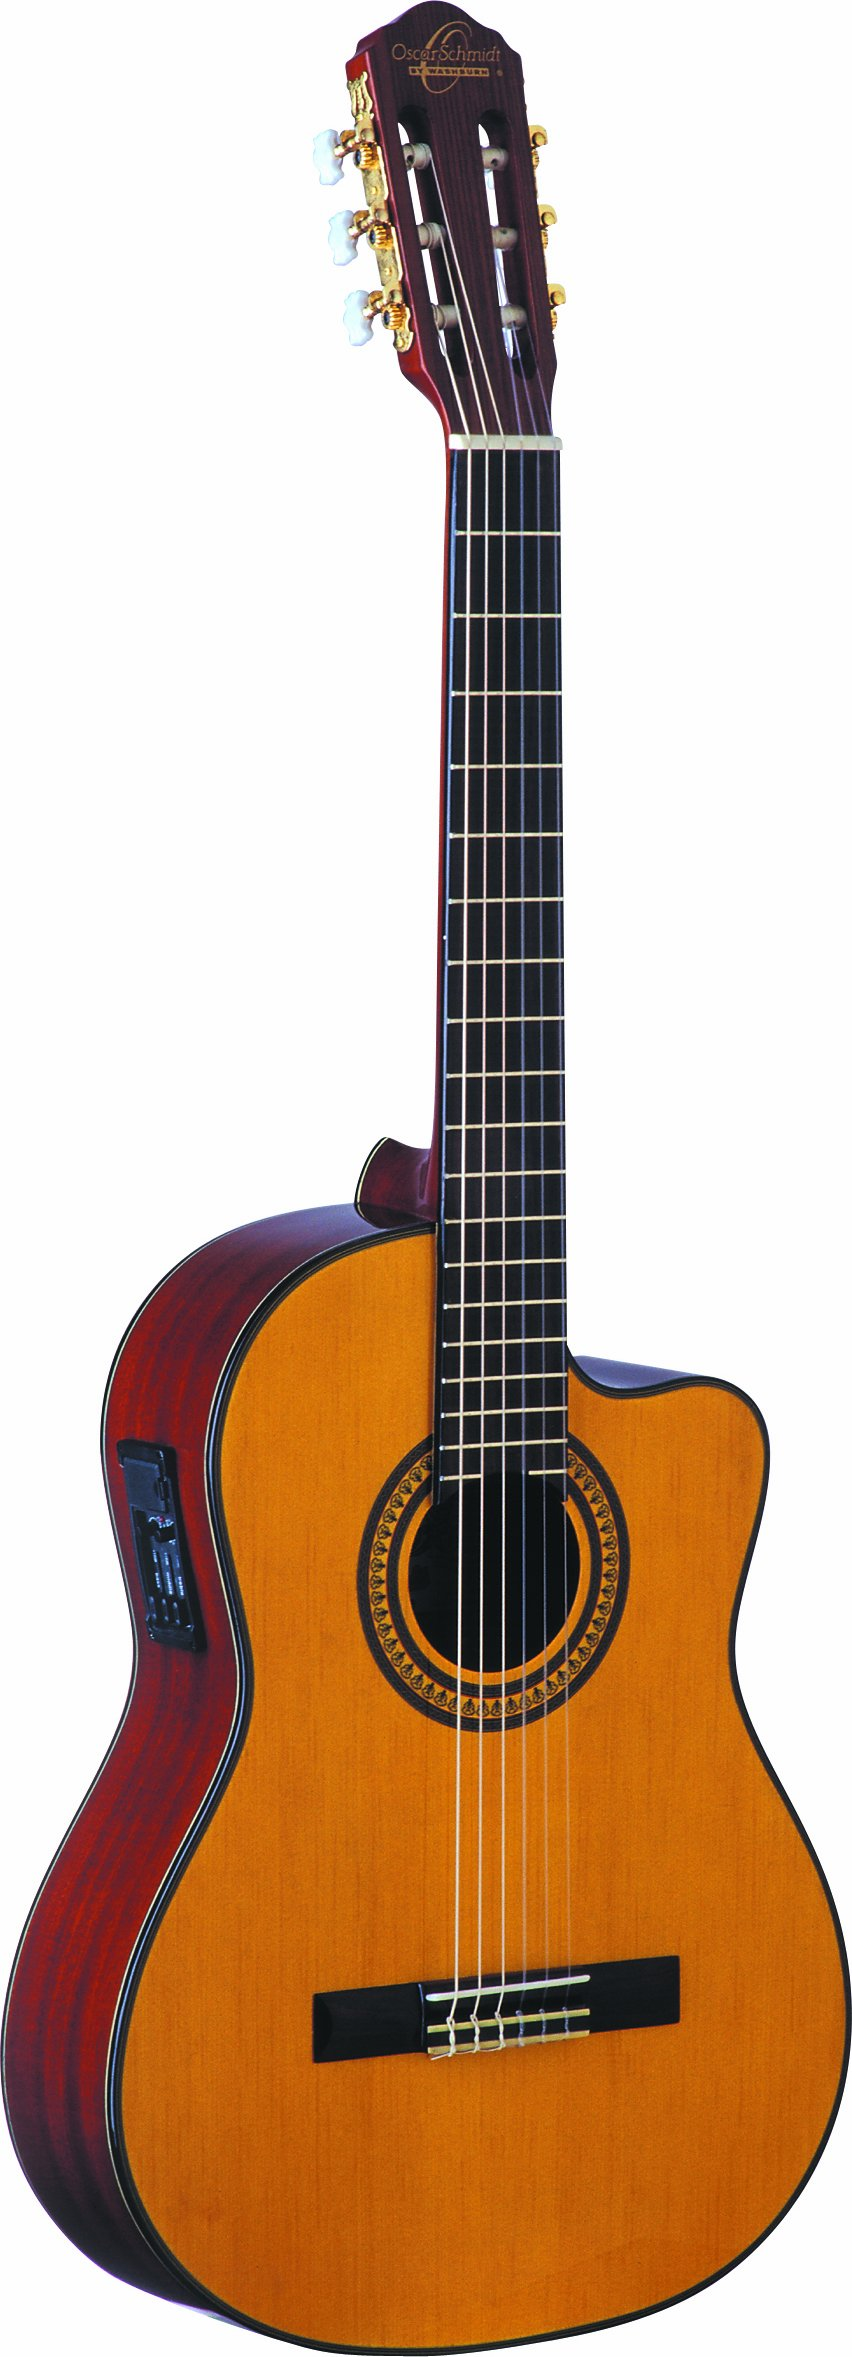 Oscar Schmidt OC11CE Classical Cutaway Acoustic-Electric Guitar - Natural